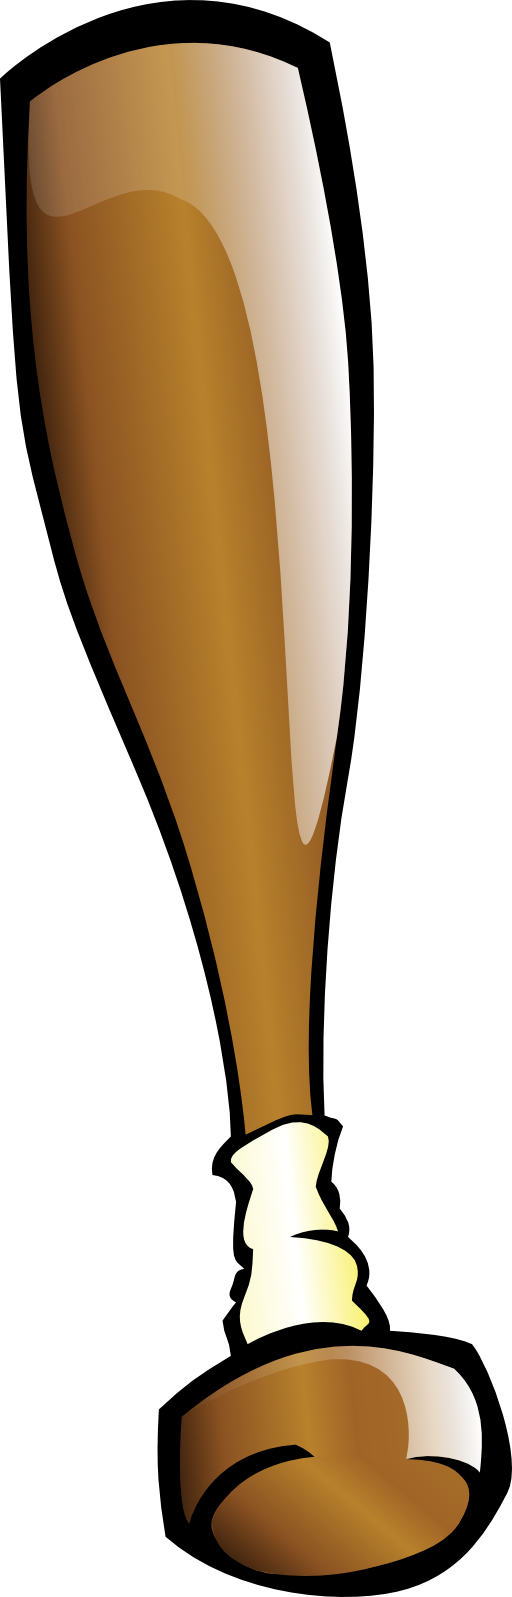 Baseball bat clipart 2